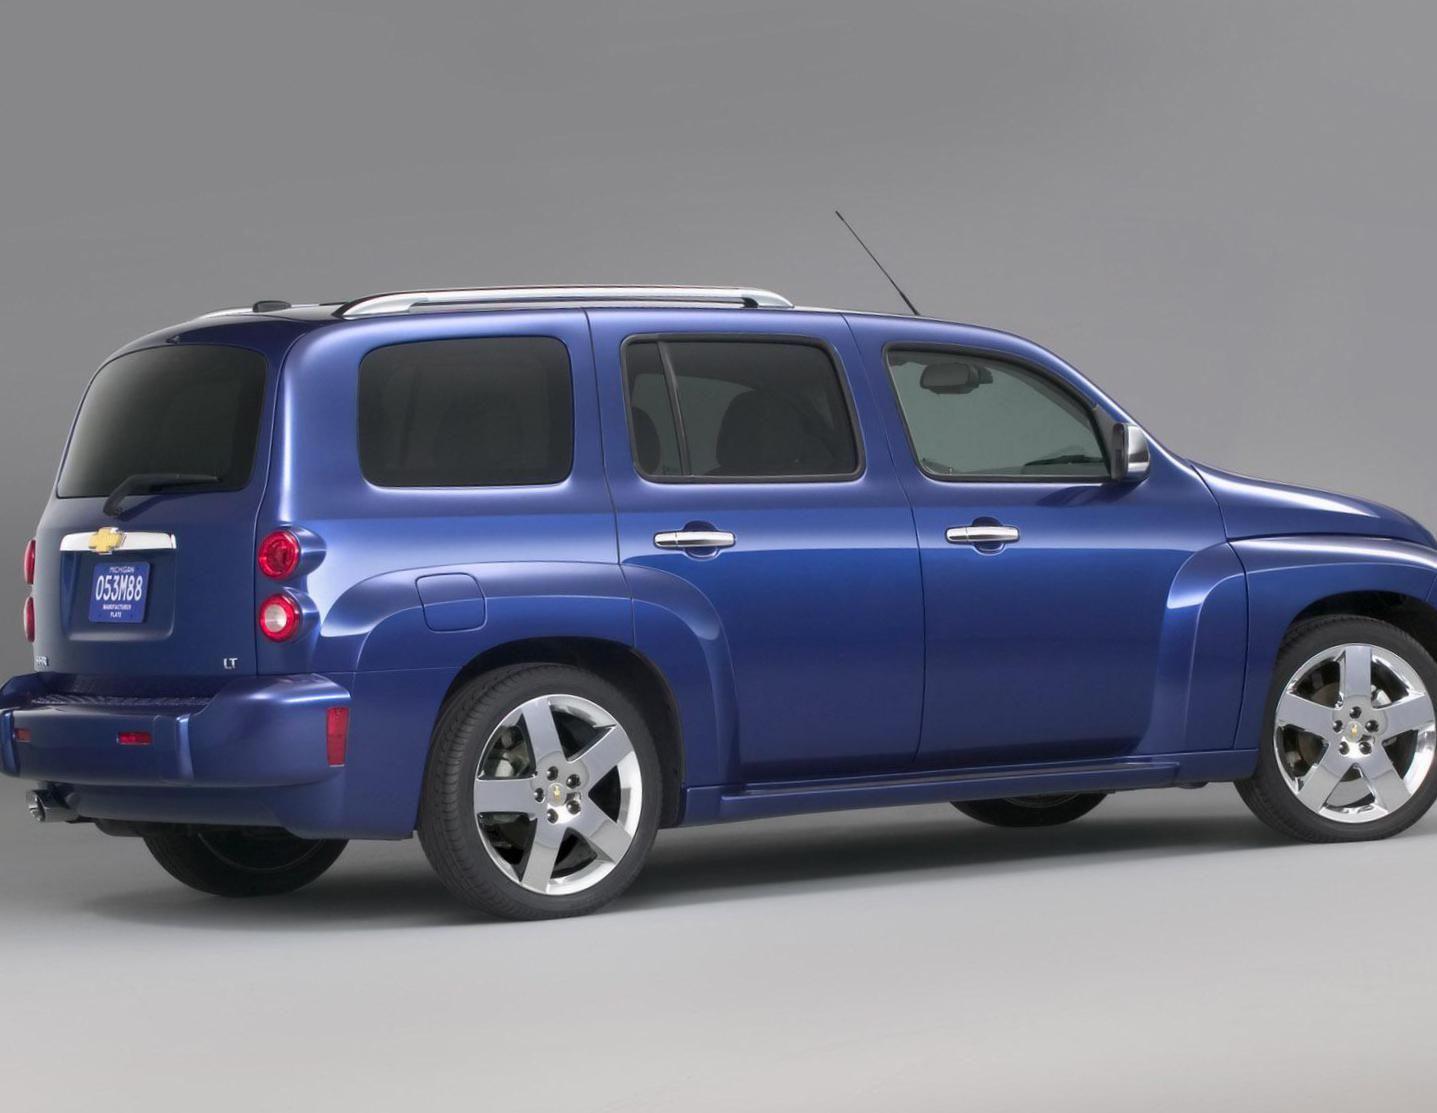 Chevrolet Hhr Panel Photos And Specs Photo Hhr Panel Chevrolet